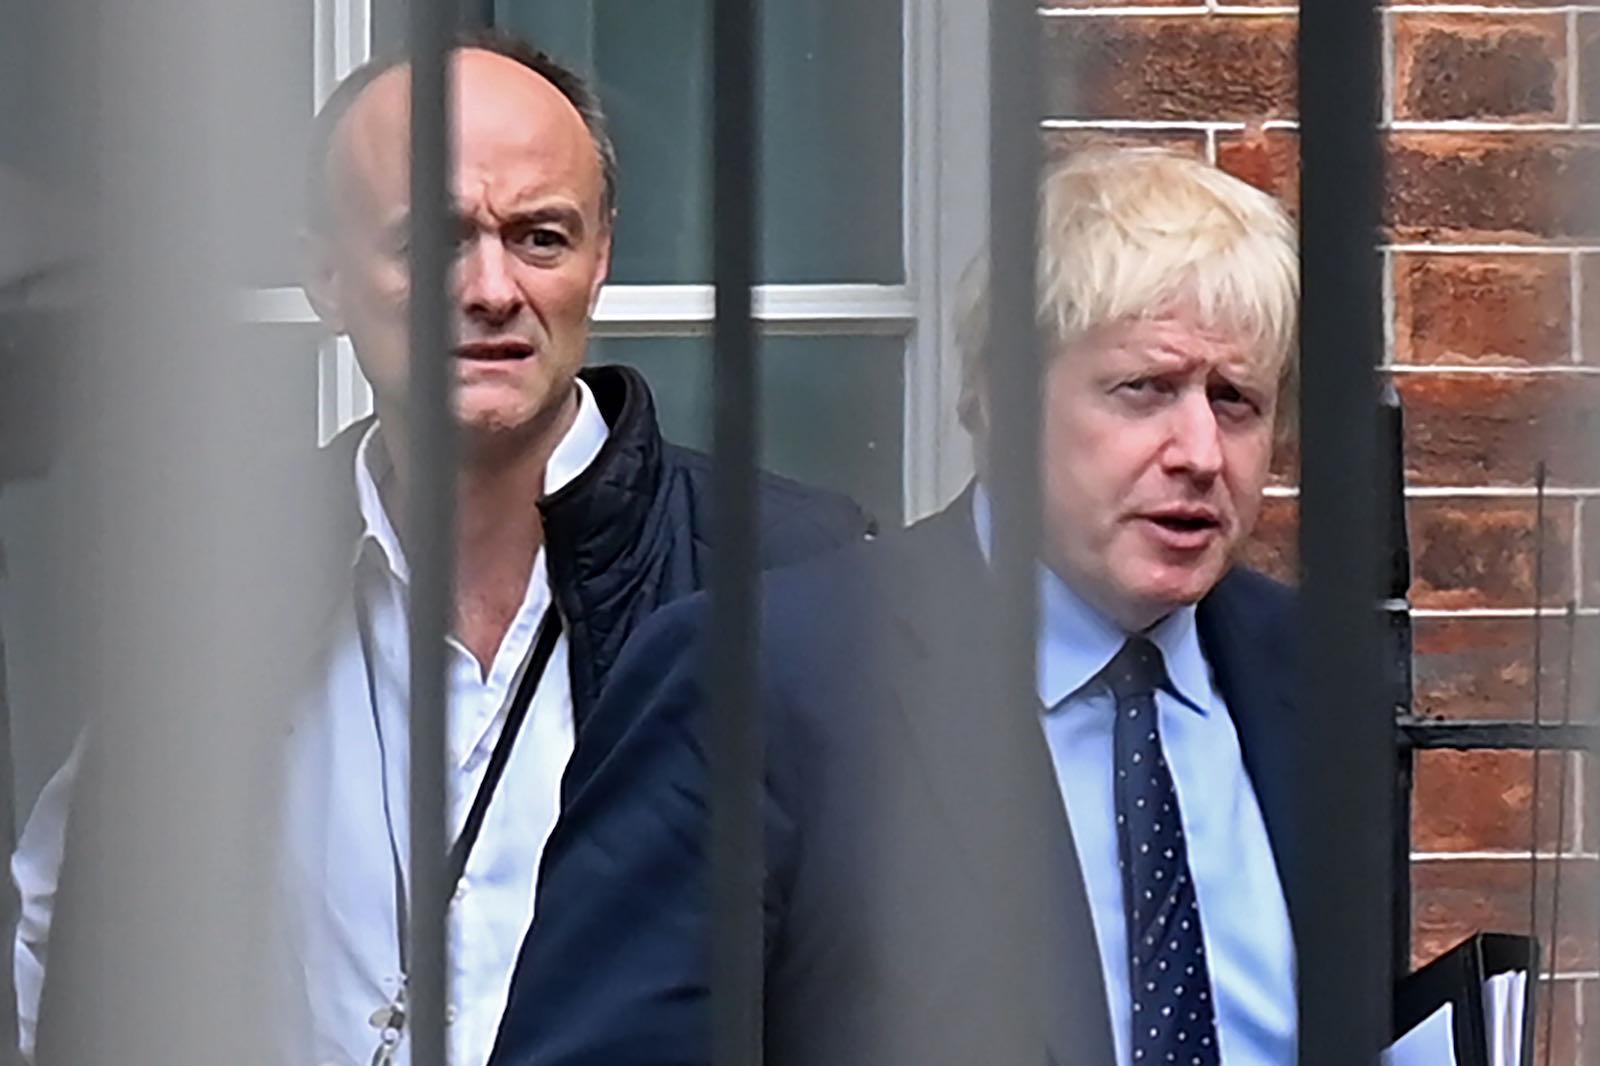 Cummings with Boris Johnson